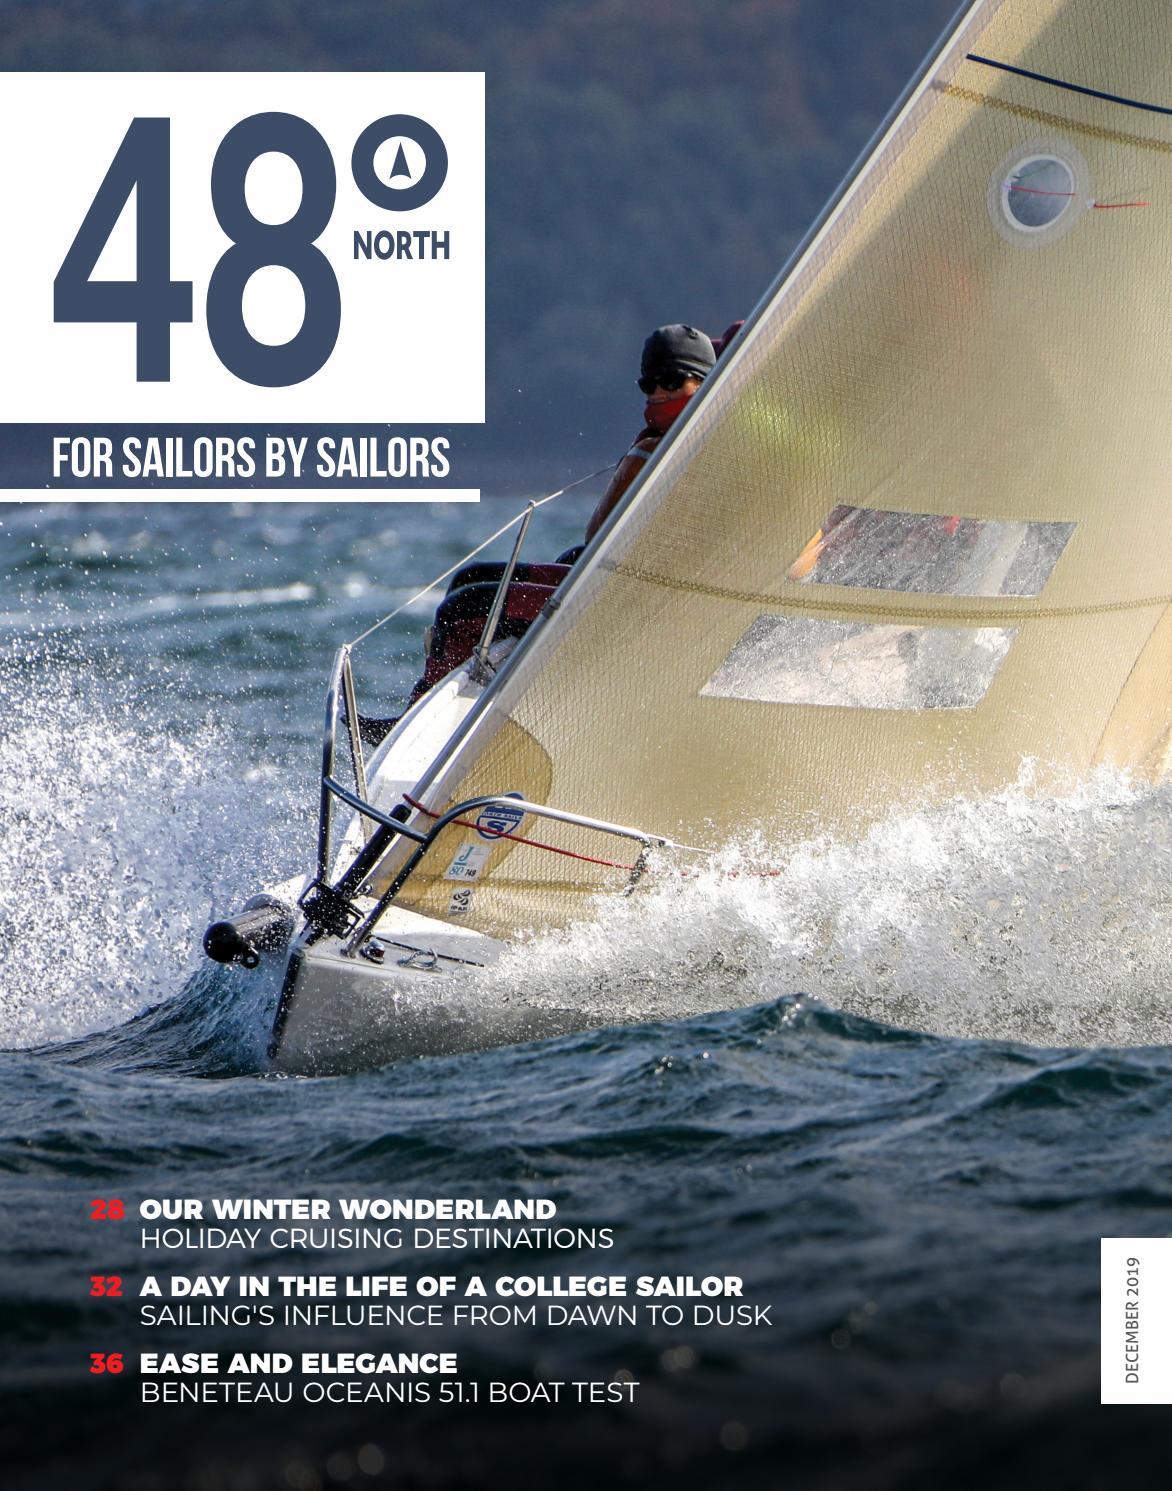 Sailboat Photo Frame Sail Away With Me Holds 6 X 4 Photo Beach Lake Island De